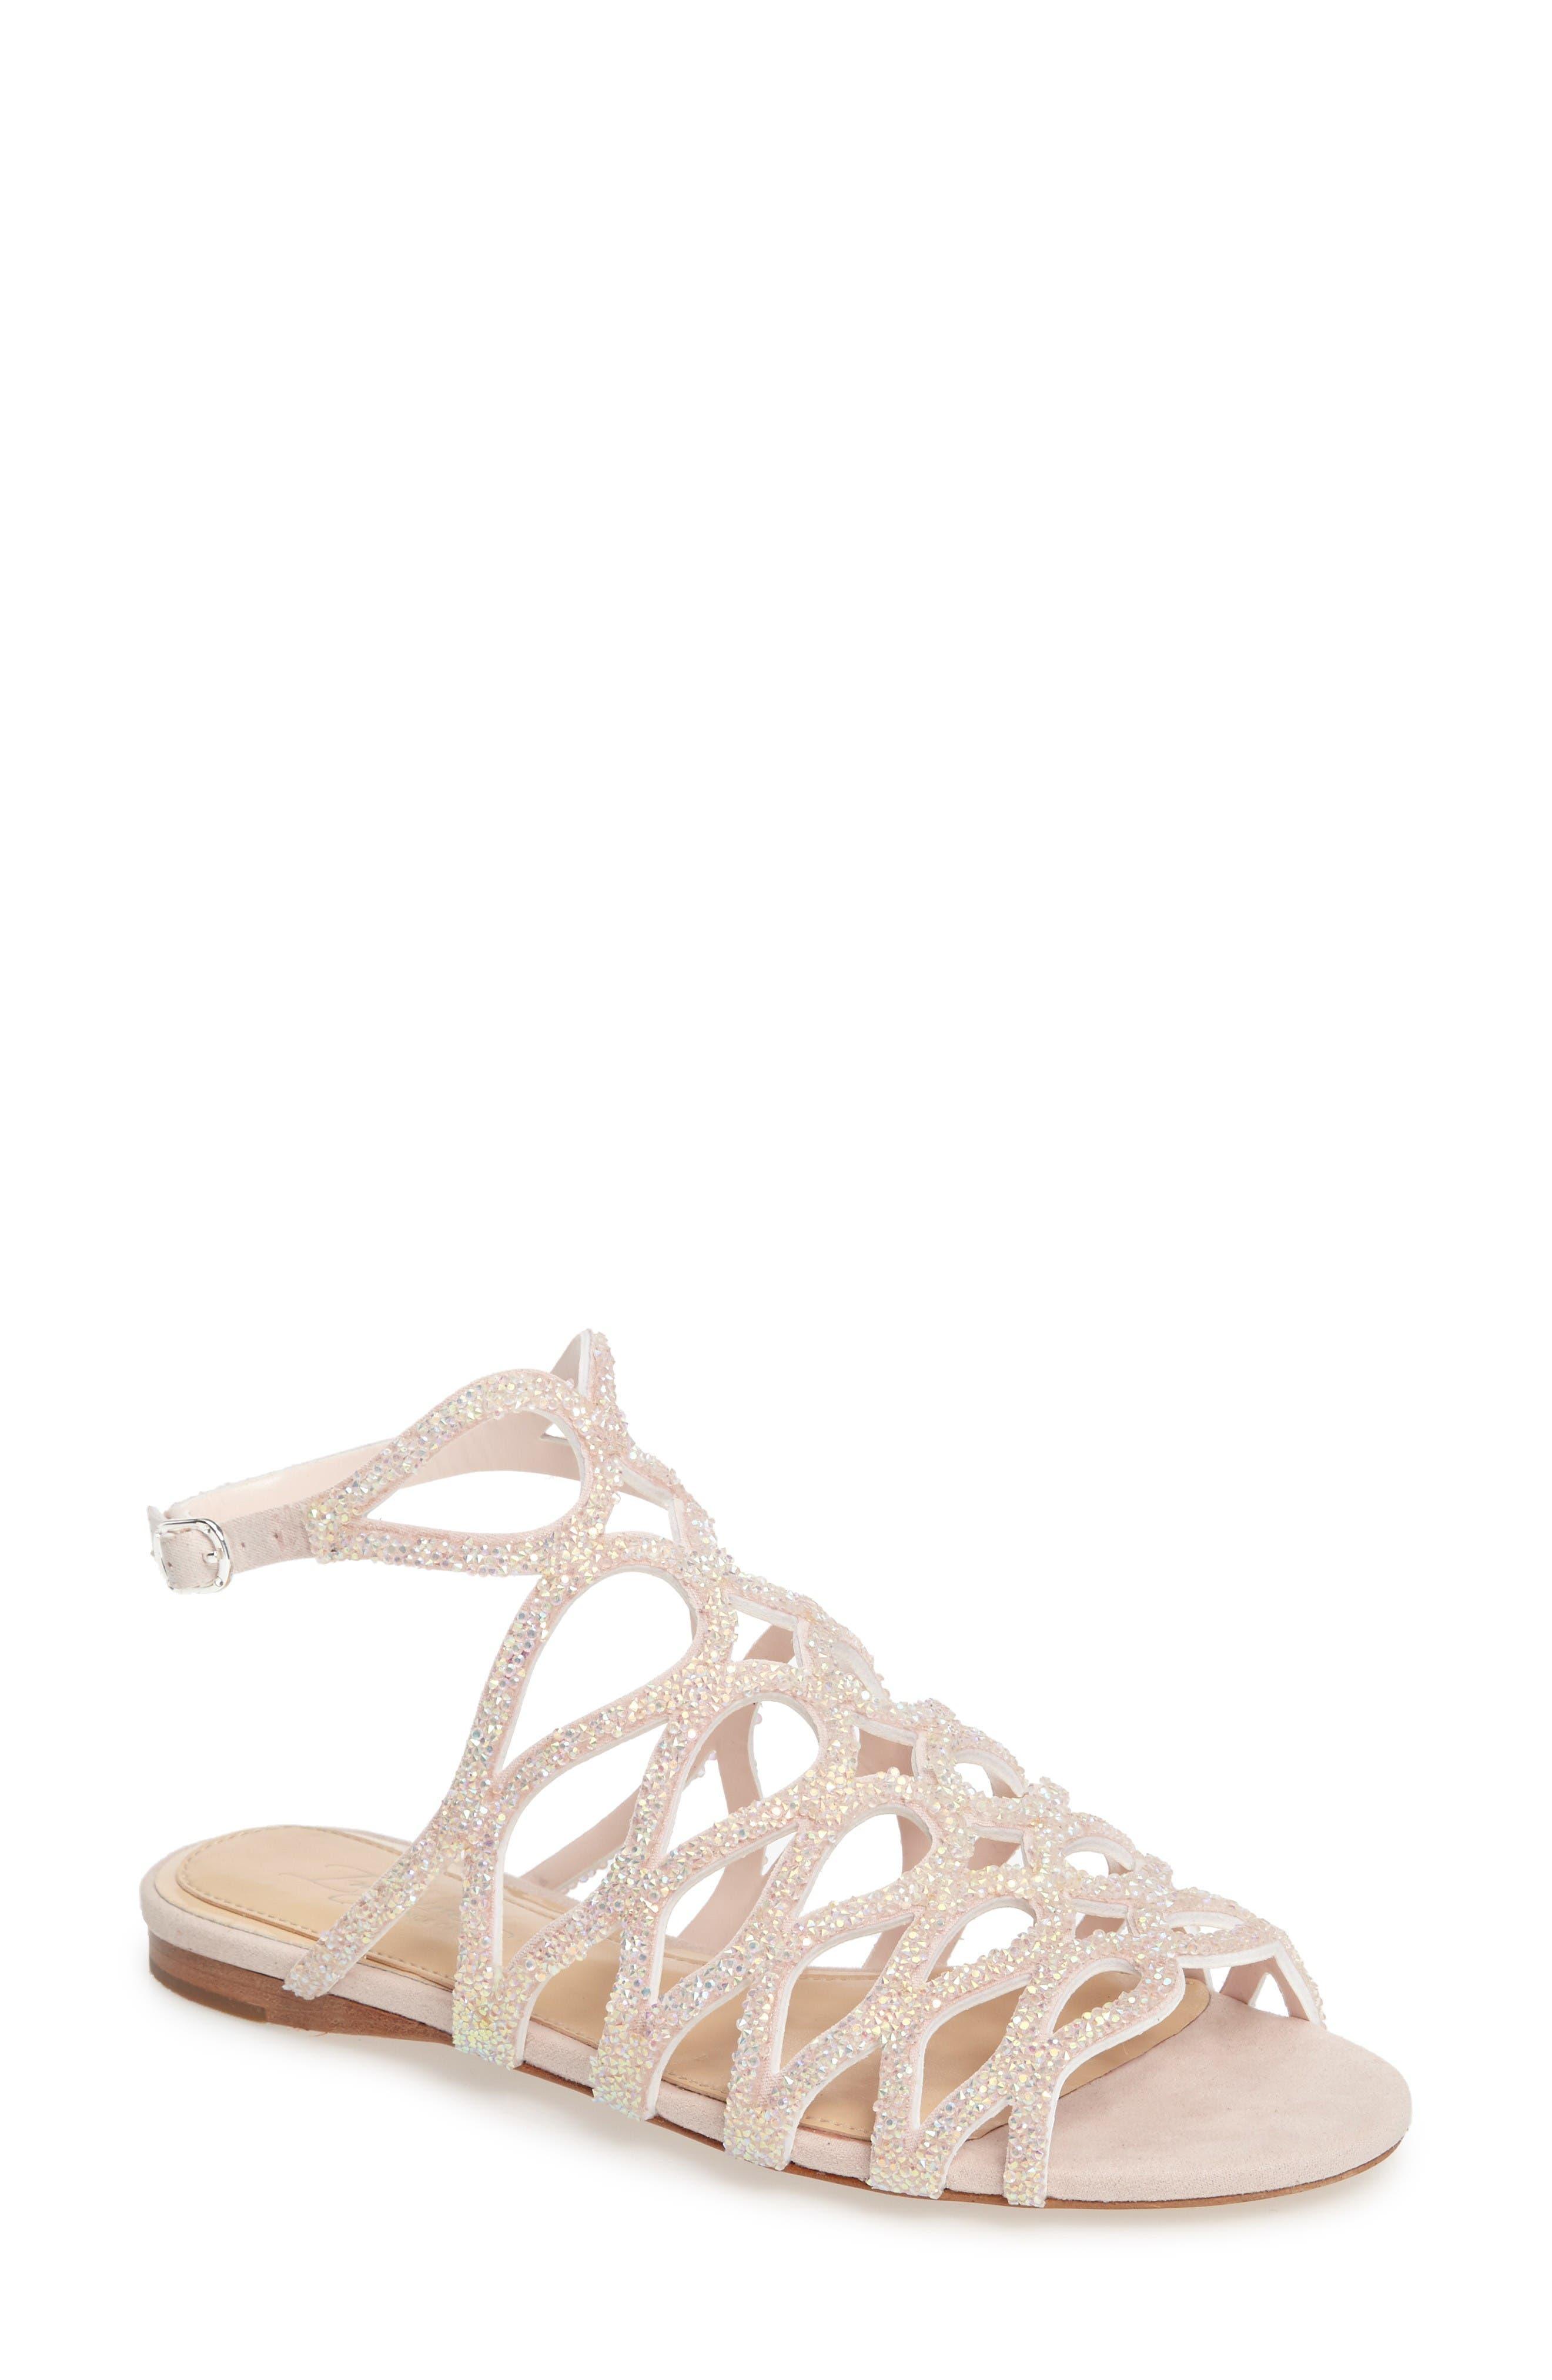 Imagine by Vince Camuto Ralee Glitter Sandal (Women)